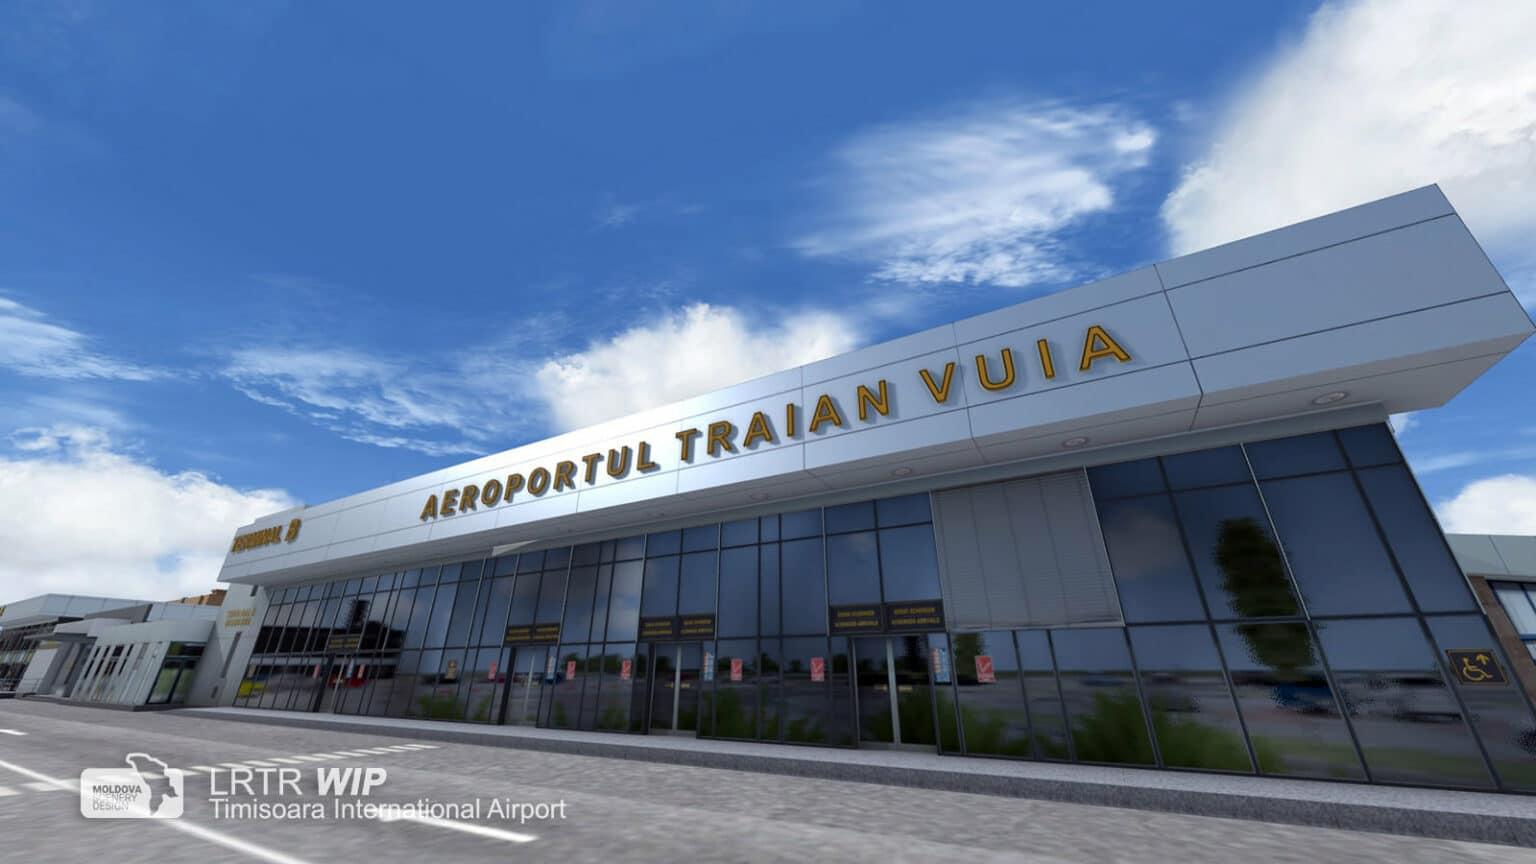 MSD_Timisoara_Airport (6)